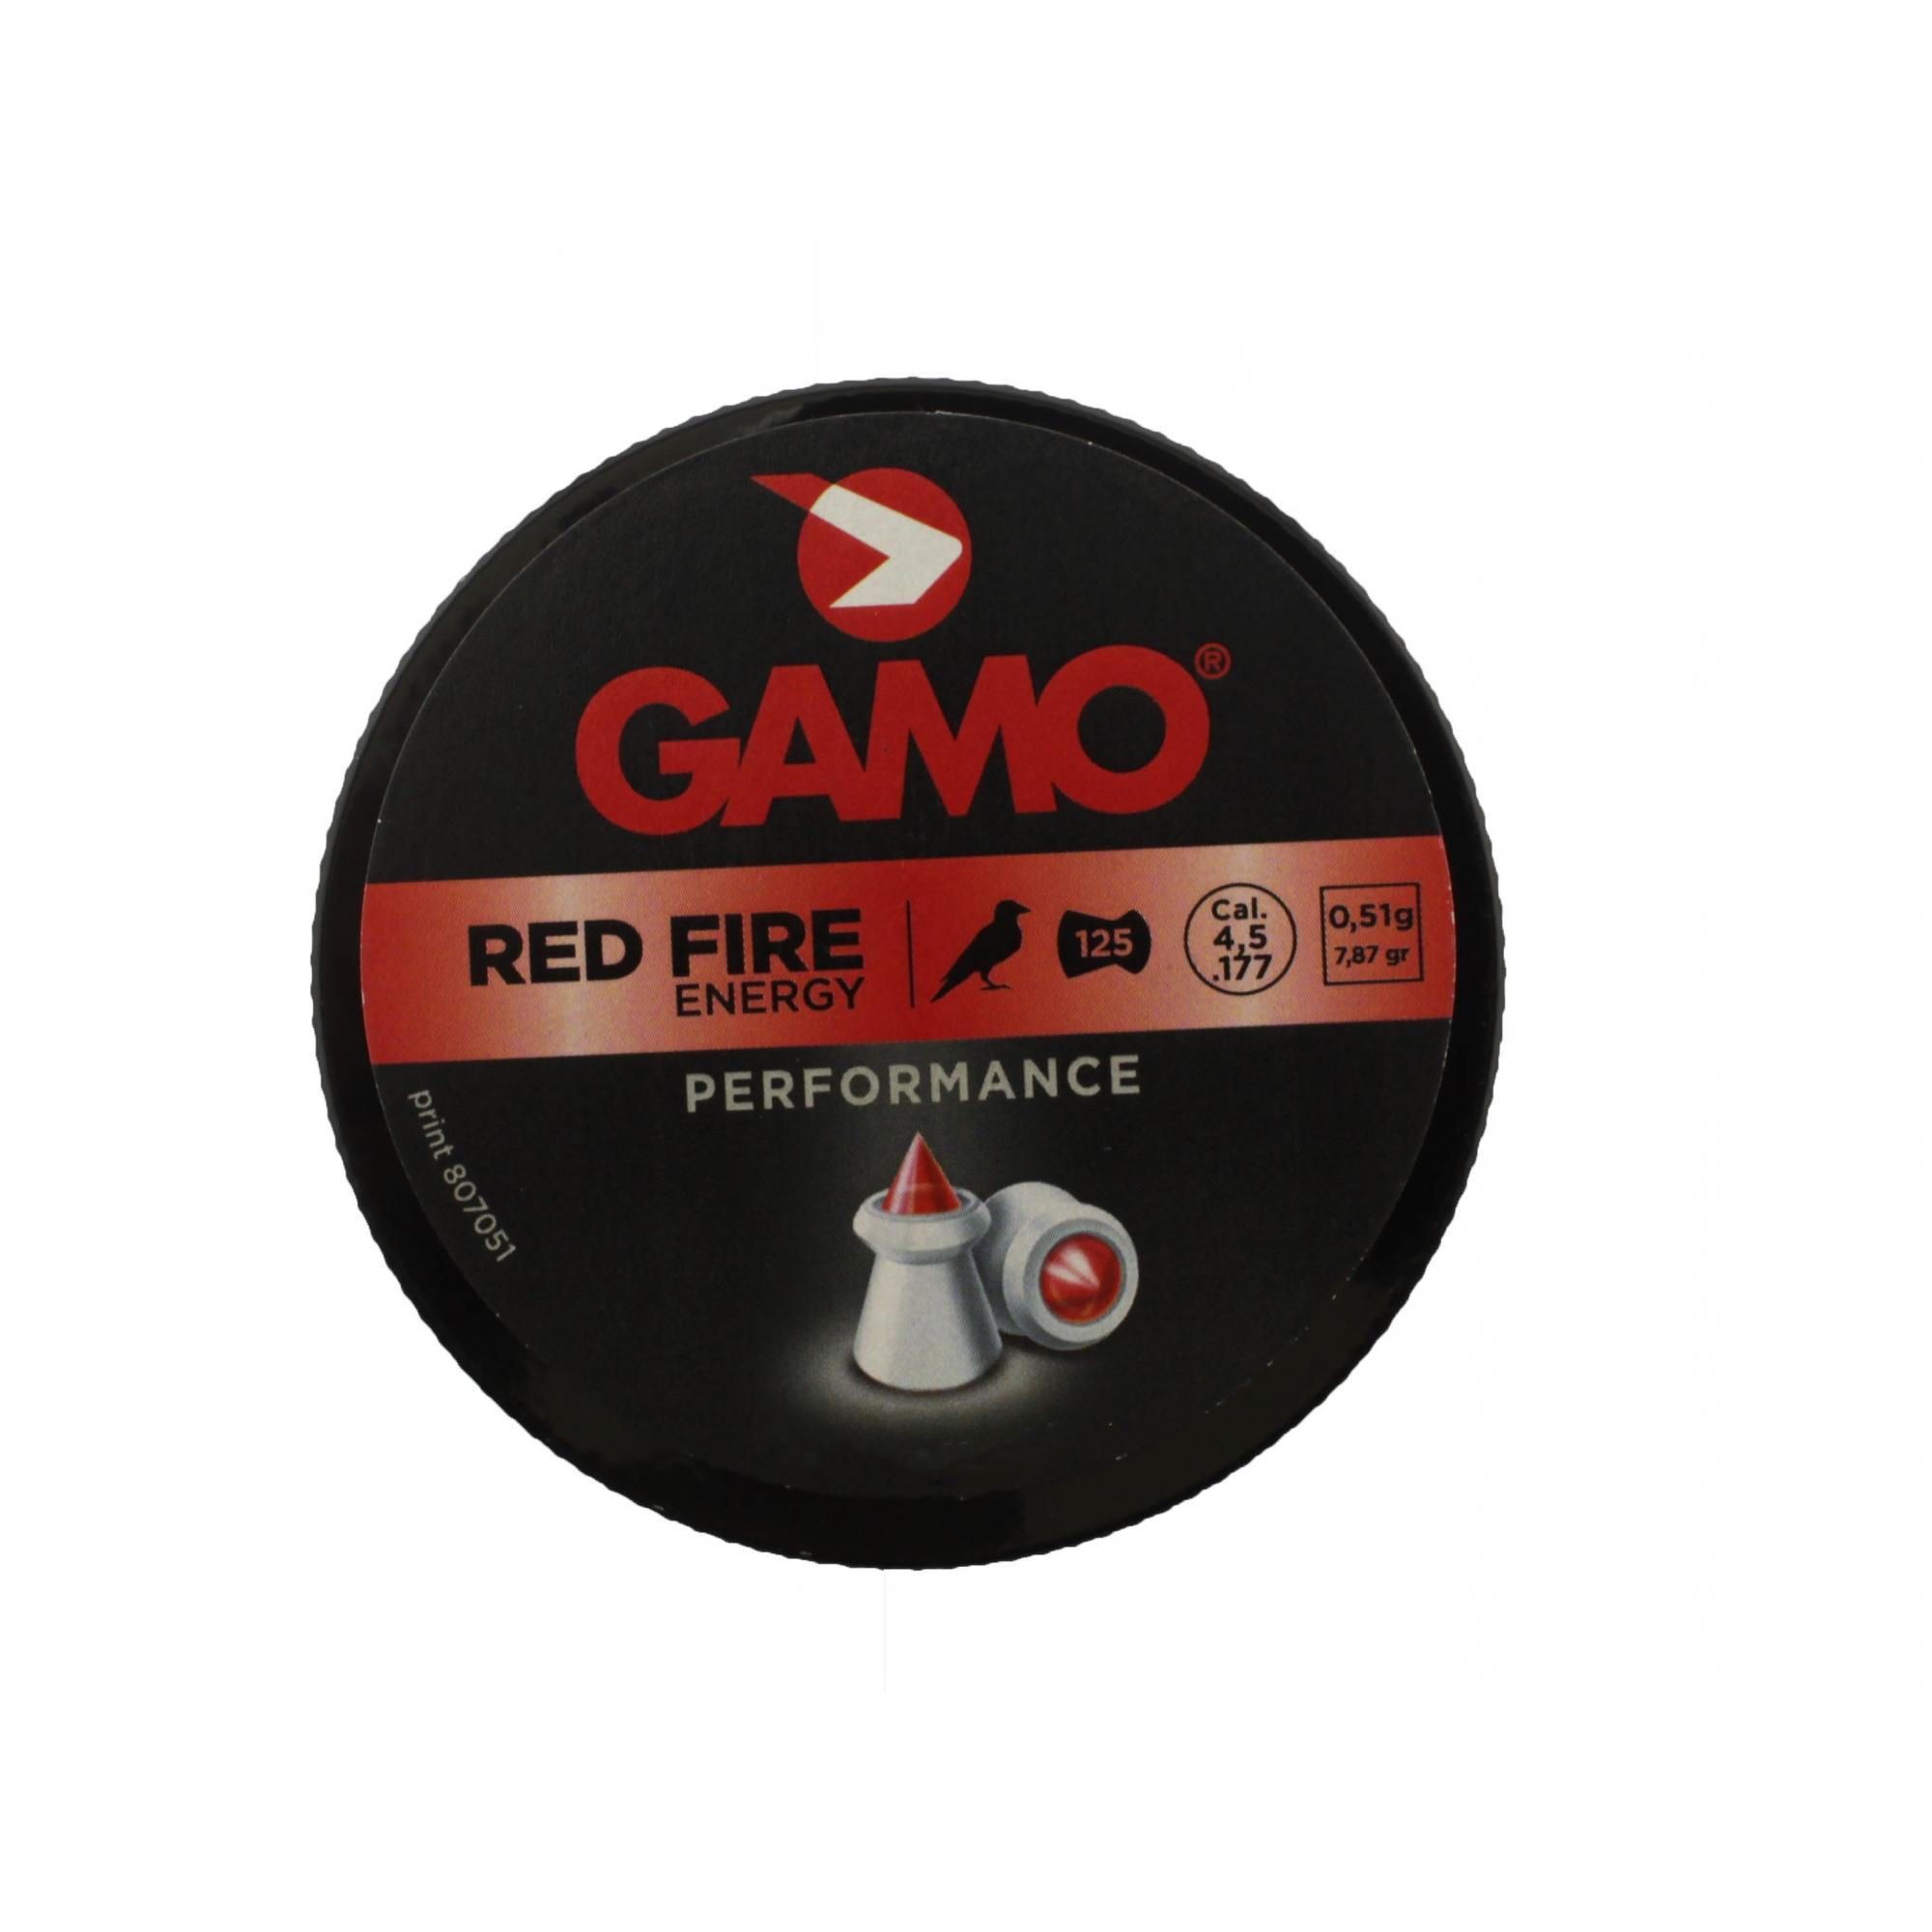 Chumbinho Gamo Red Fire Energy - 4.5mm